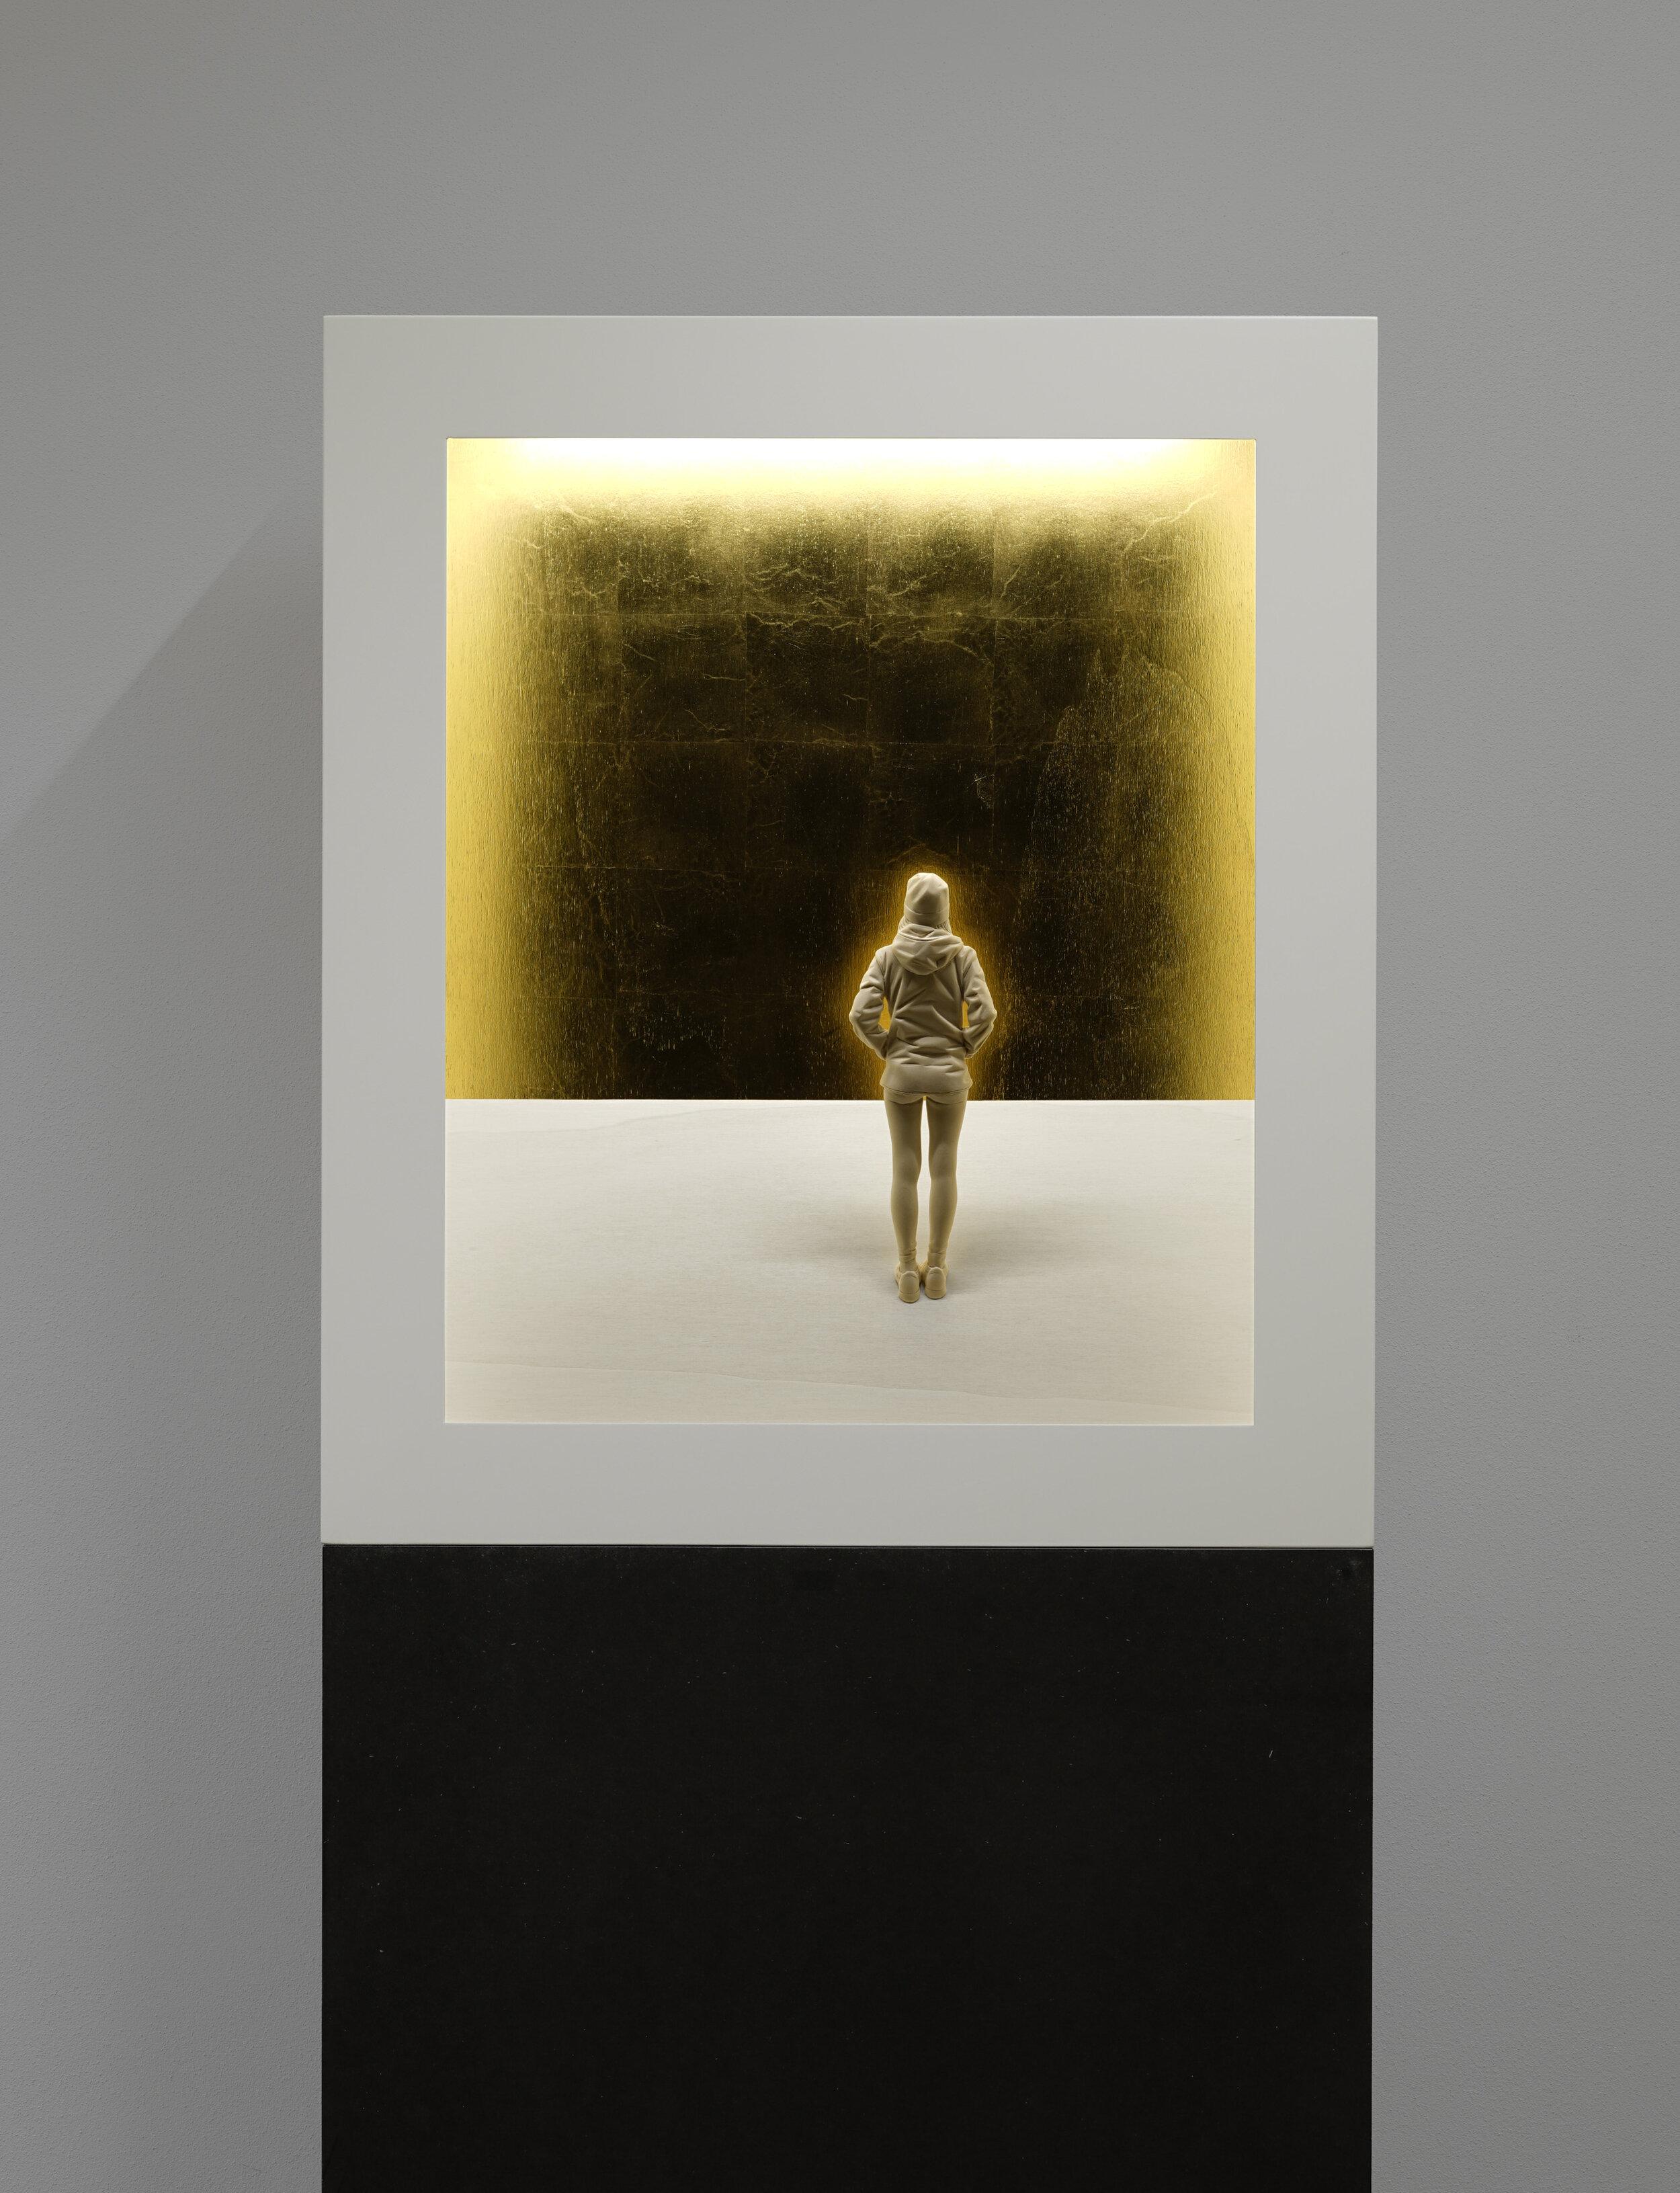 Aura 1,  2019 Linden wood, acrylic paint, gold leaf, LED light 27 1/2 x 23 1/2 x 8 inches